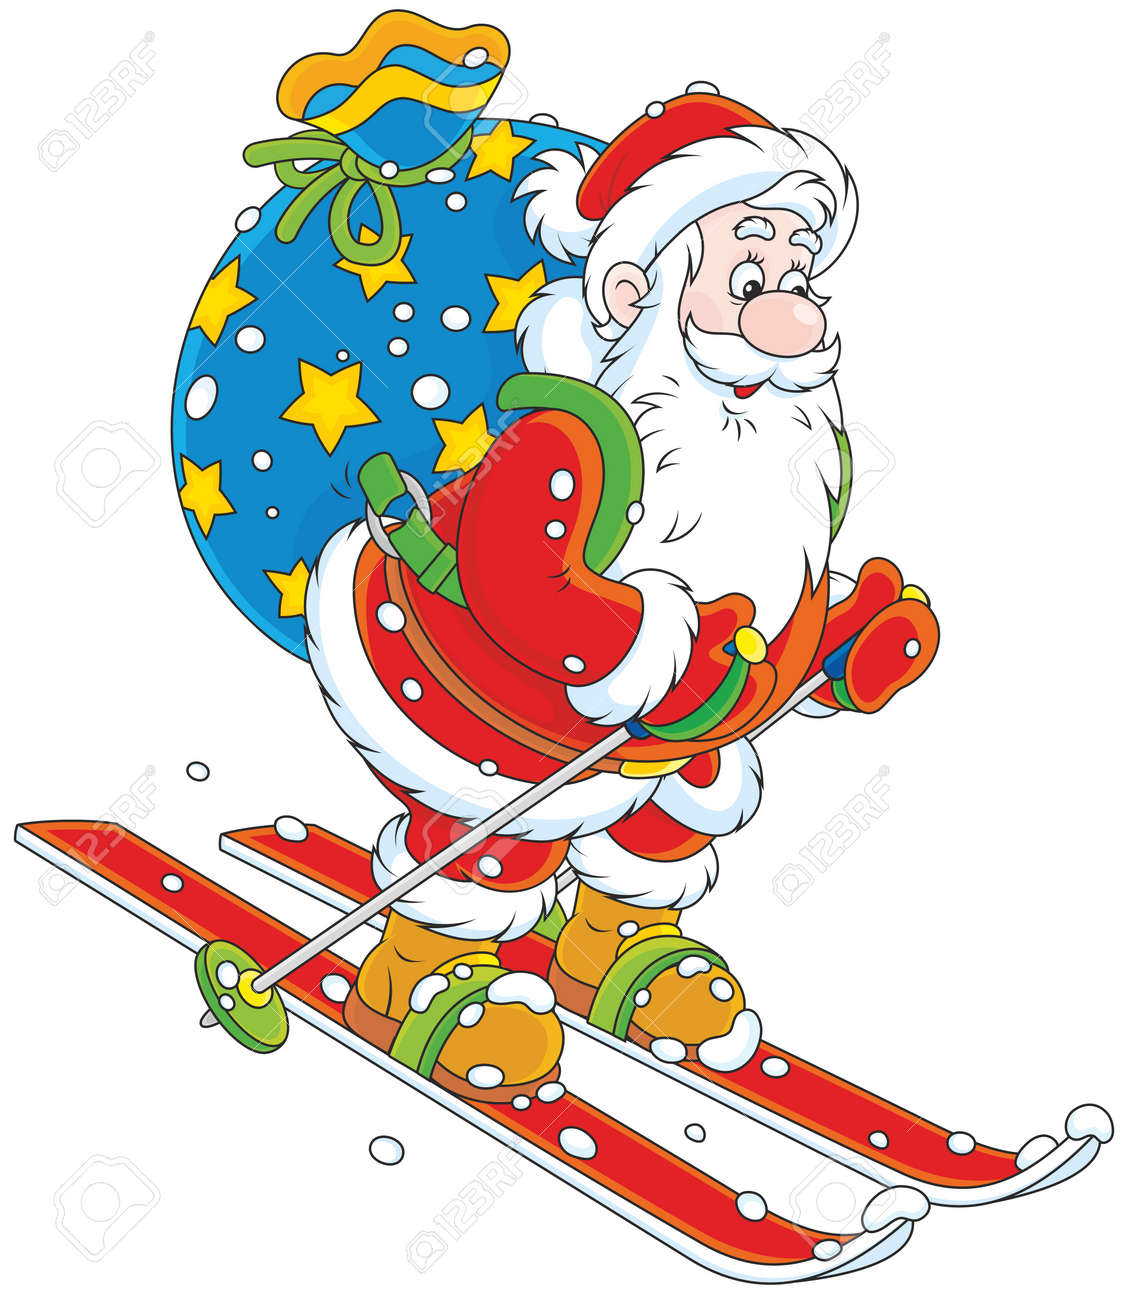 Image Pere Noel En Ski.Pere Noel Avec Des Cadeaux De Ski